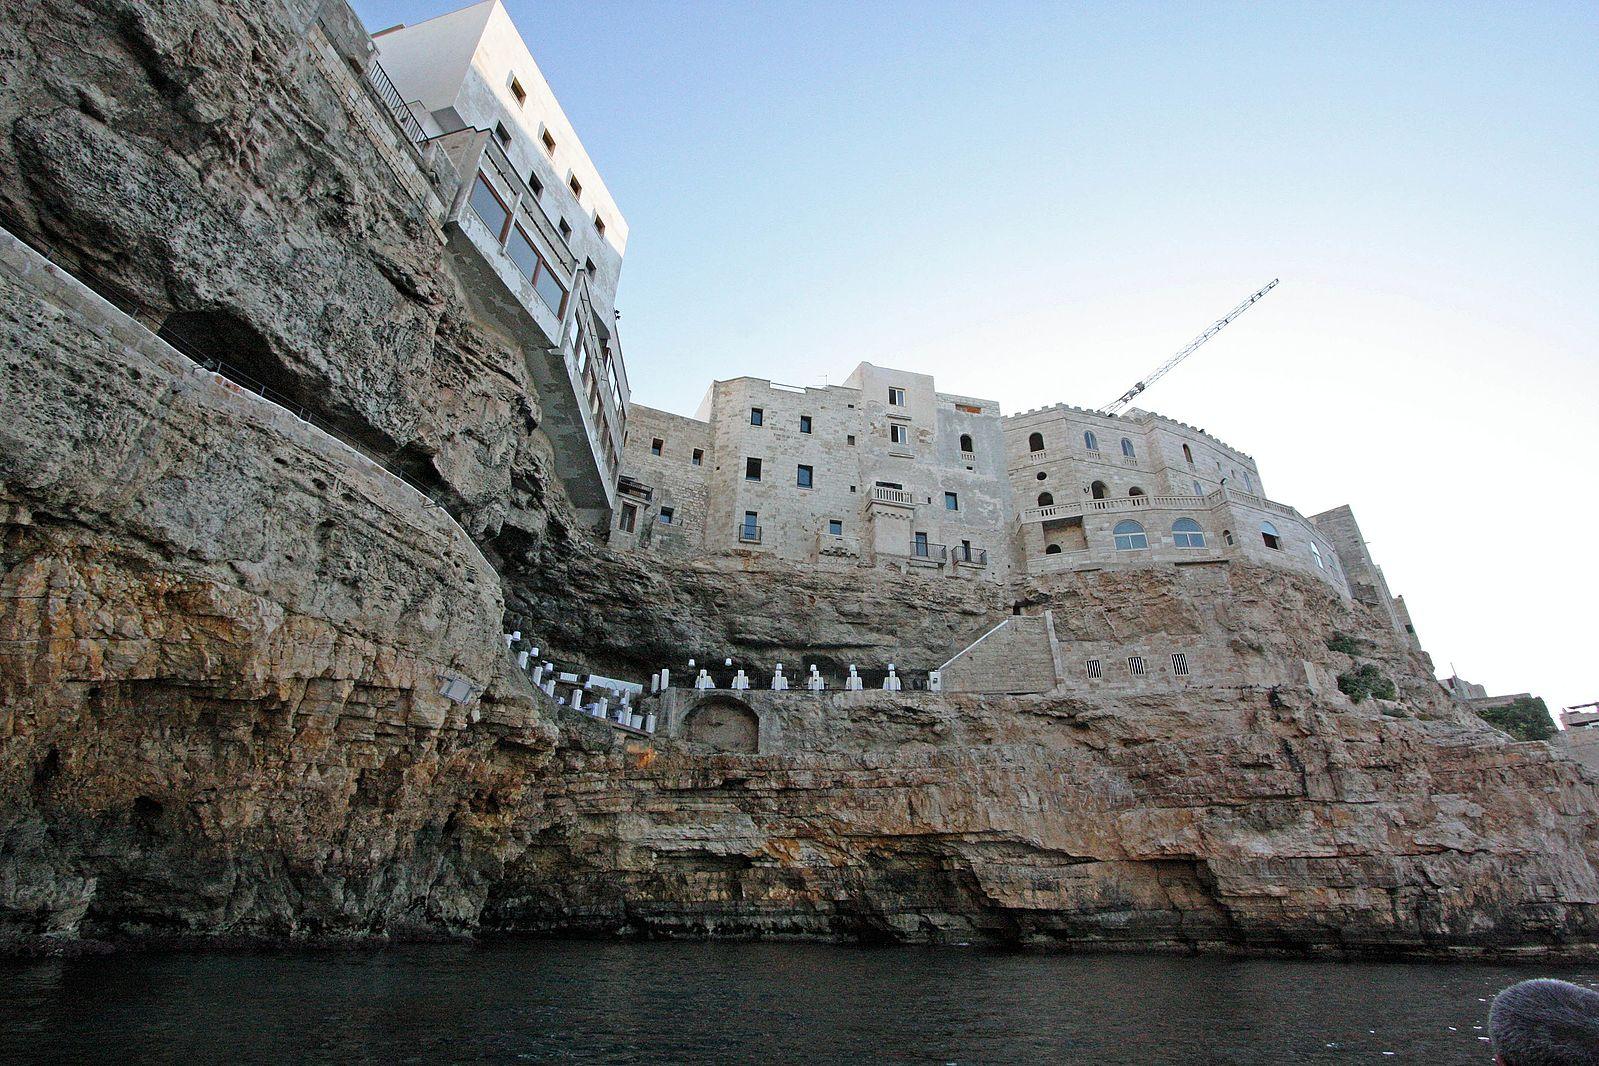 Grotta Palazzese, a cave restaurant in Puglia